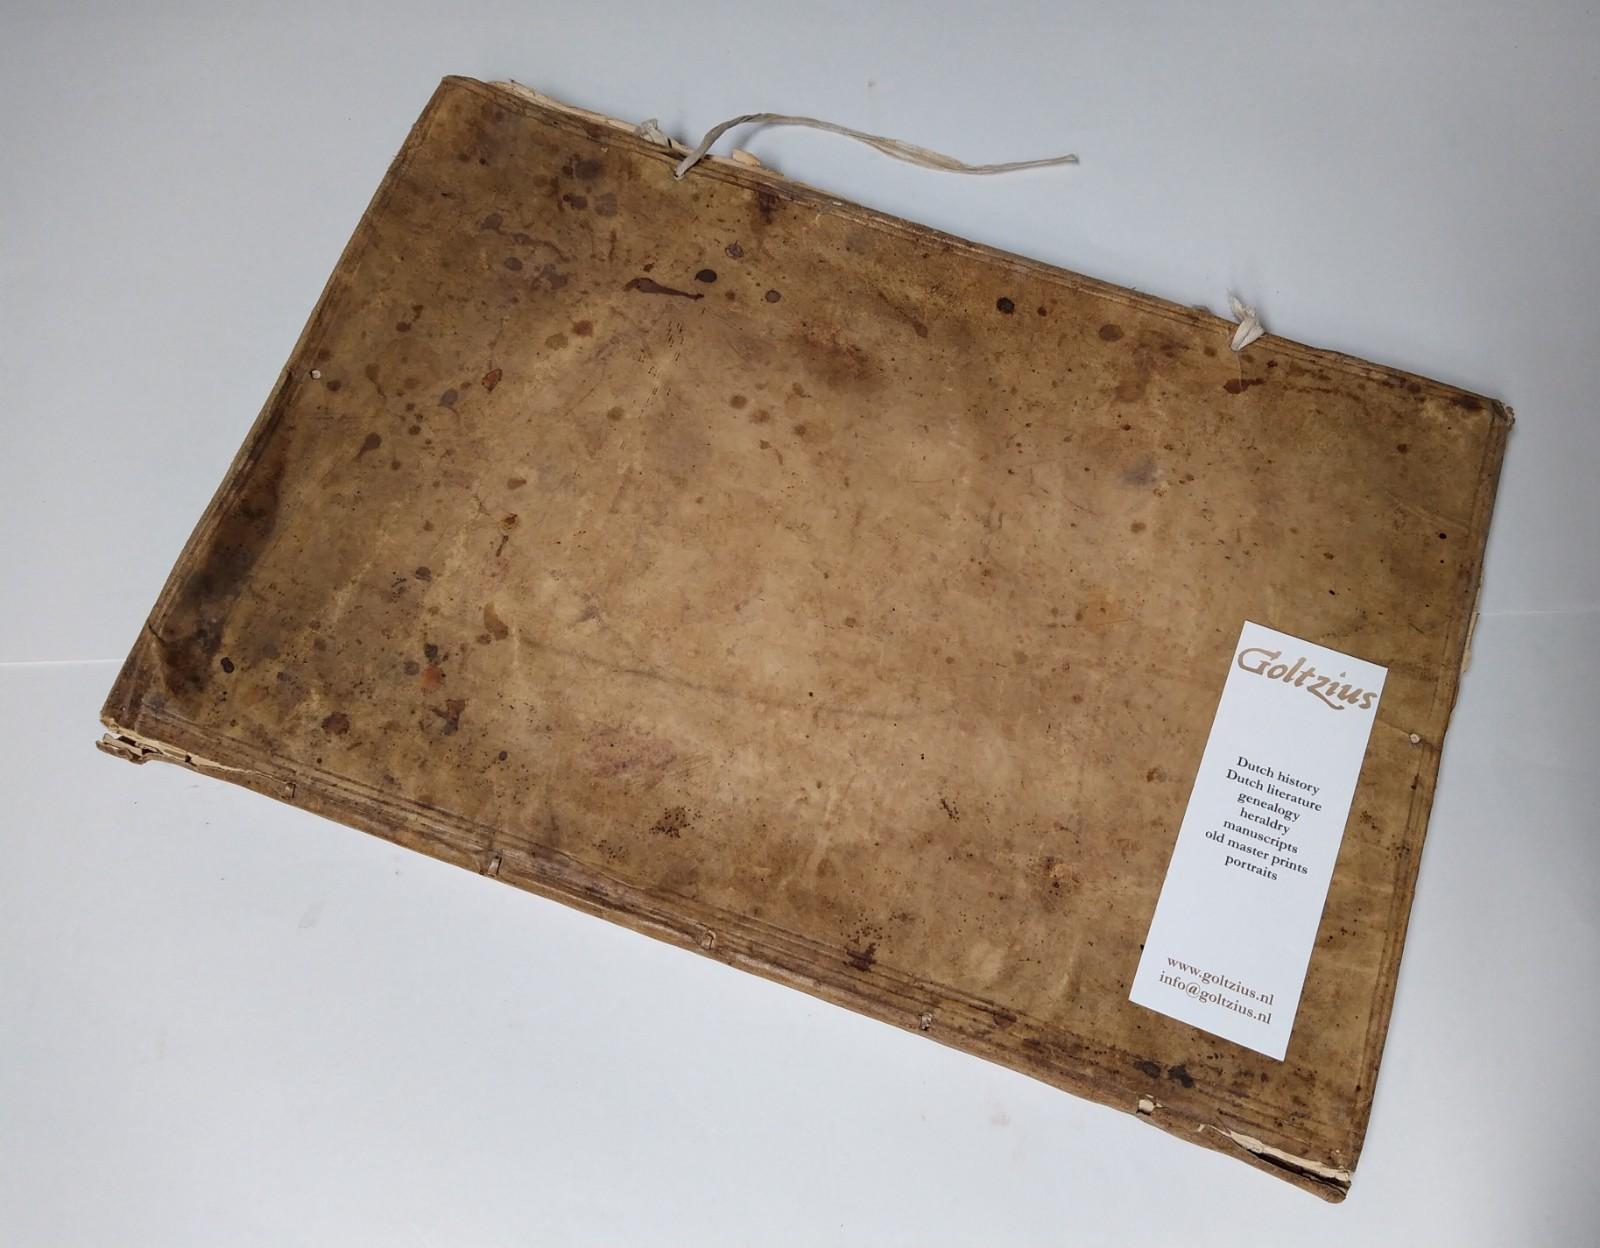 COTRELL, DESPRES, FRANCE Manuscript genealogy of the descendants of Gerard de Lestruuerie (Lyestruues, dec. 1330) and Masrie de la Cauchie.